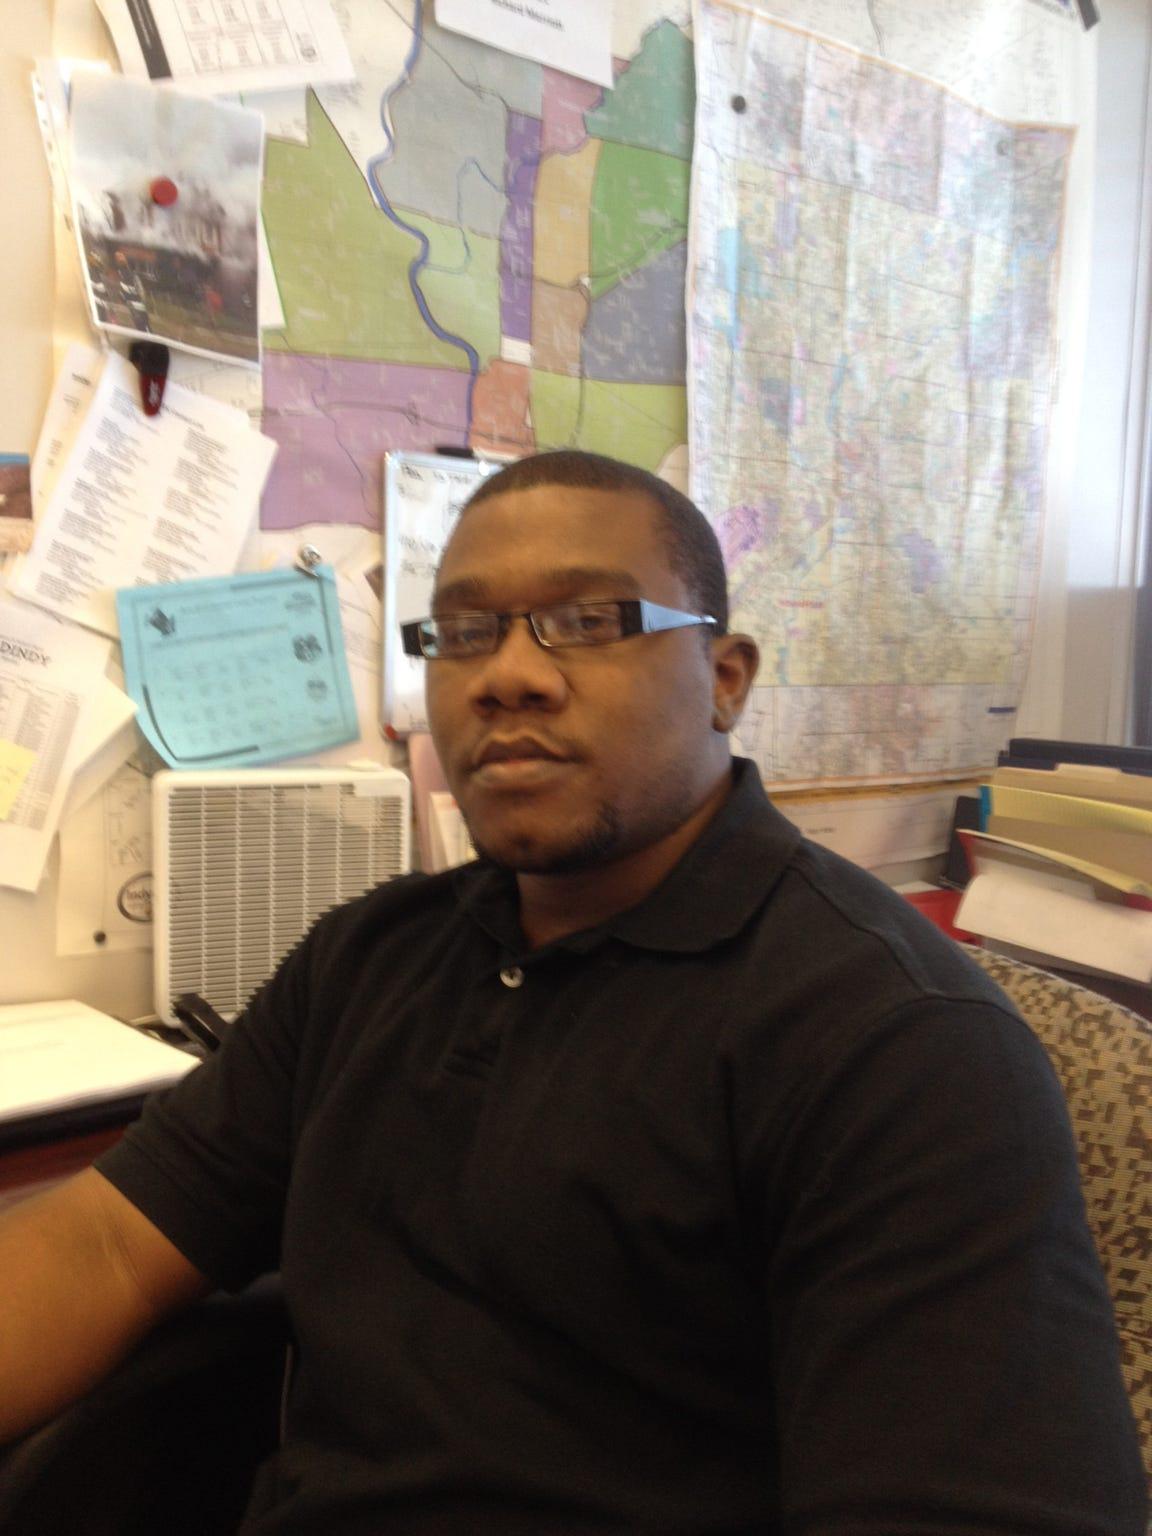 Former city Land Bank administrator Reggie Walton was